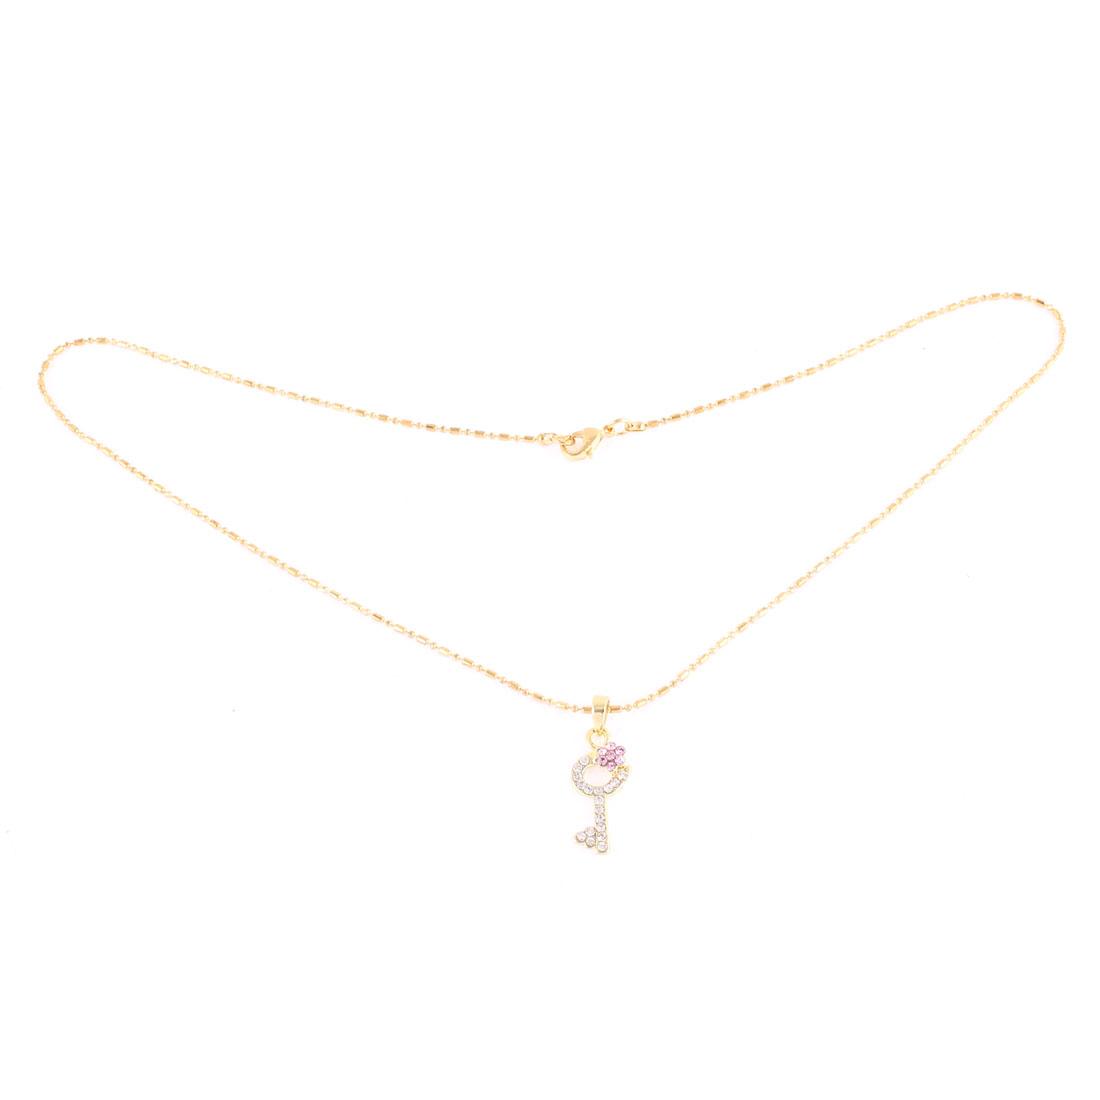 Lady Women Rhinestone Pendant Gold Tone Slim Chain Necklace Jewelry Gift